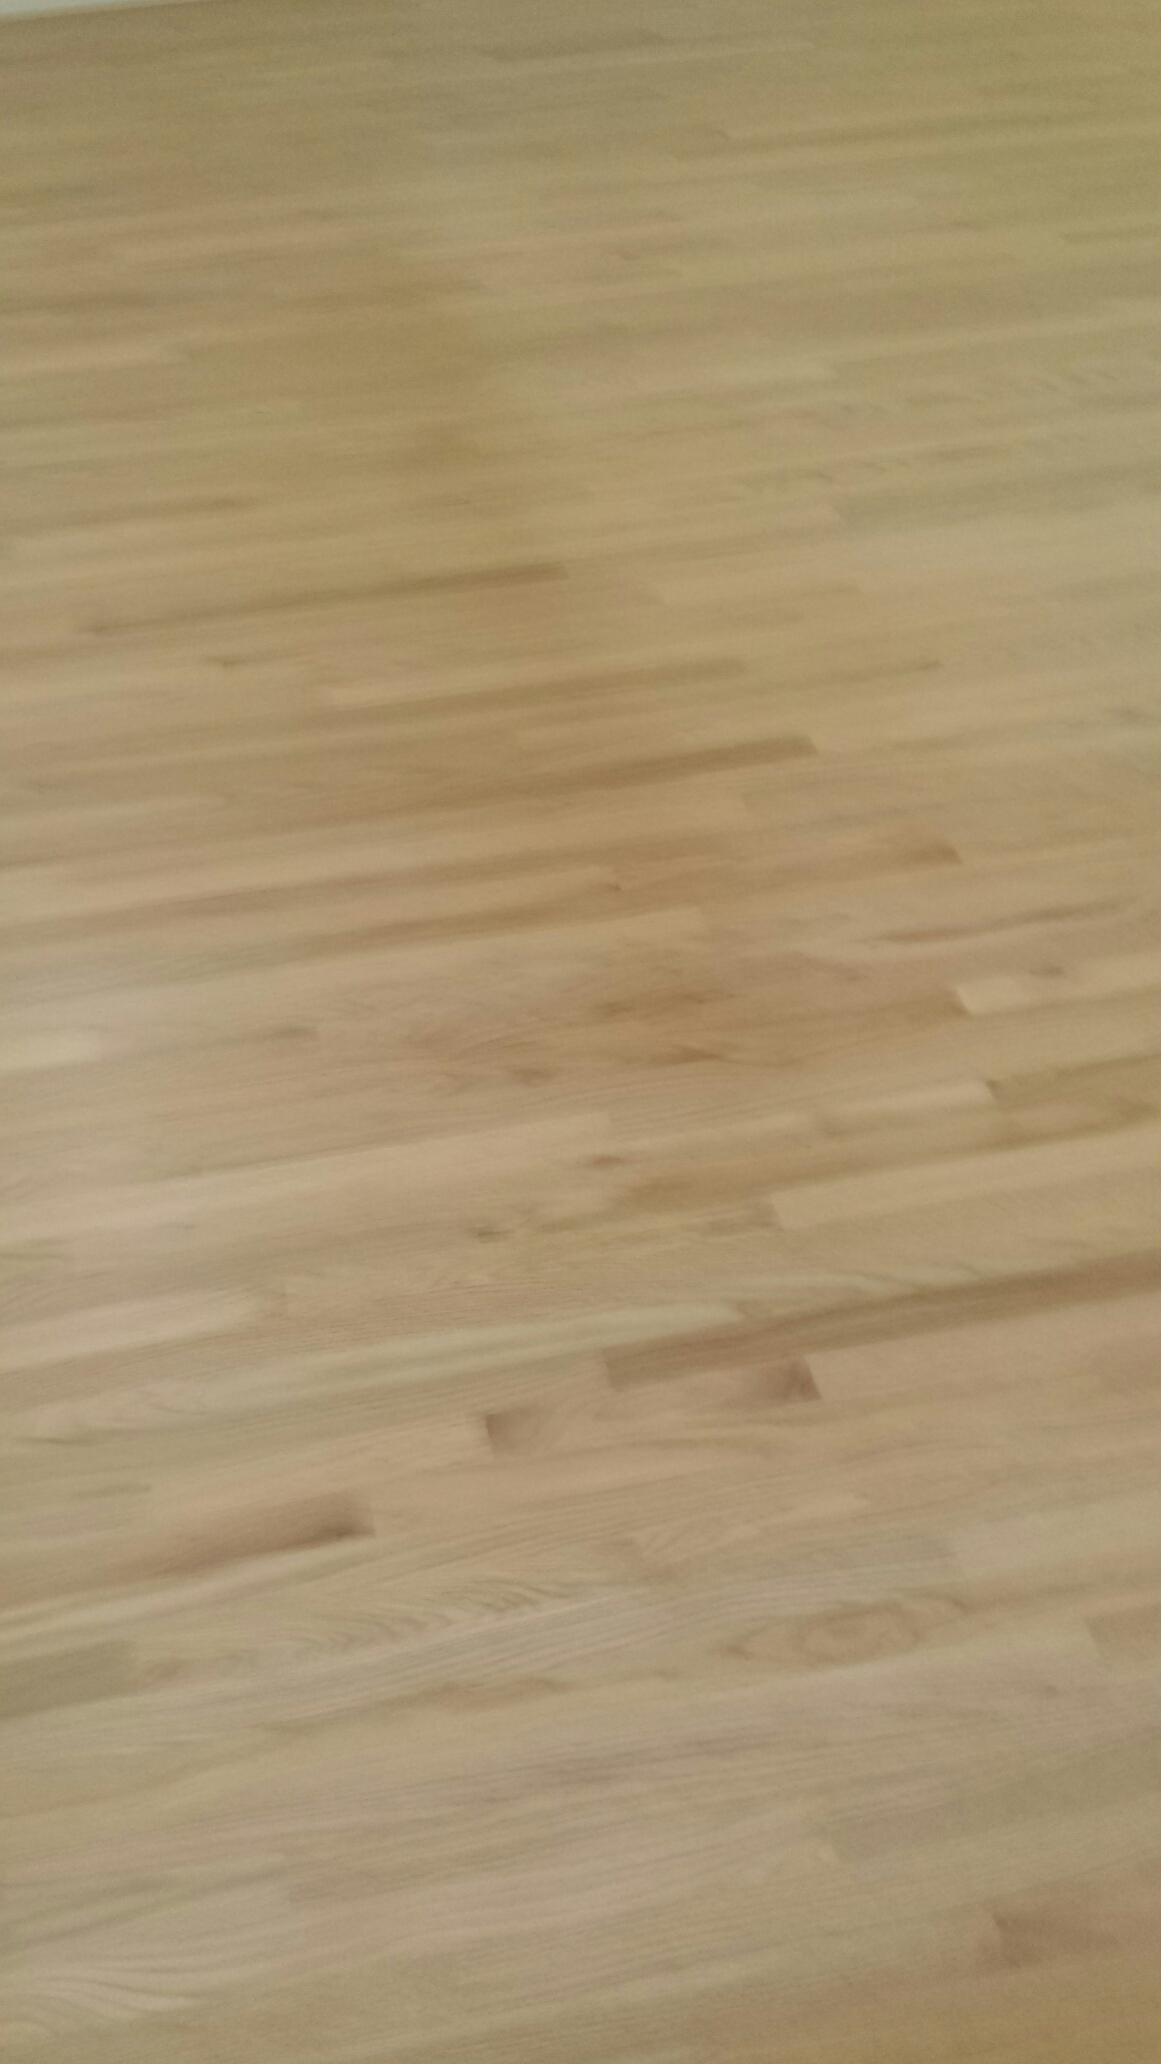 Sand oakwood floor, bleachwood, white color on top, finish white, 4 coats of non yellowing polyurethane.